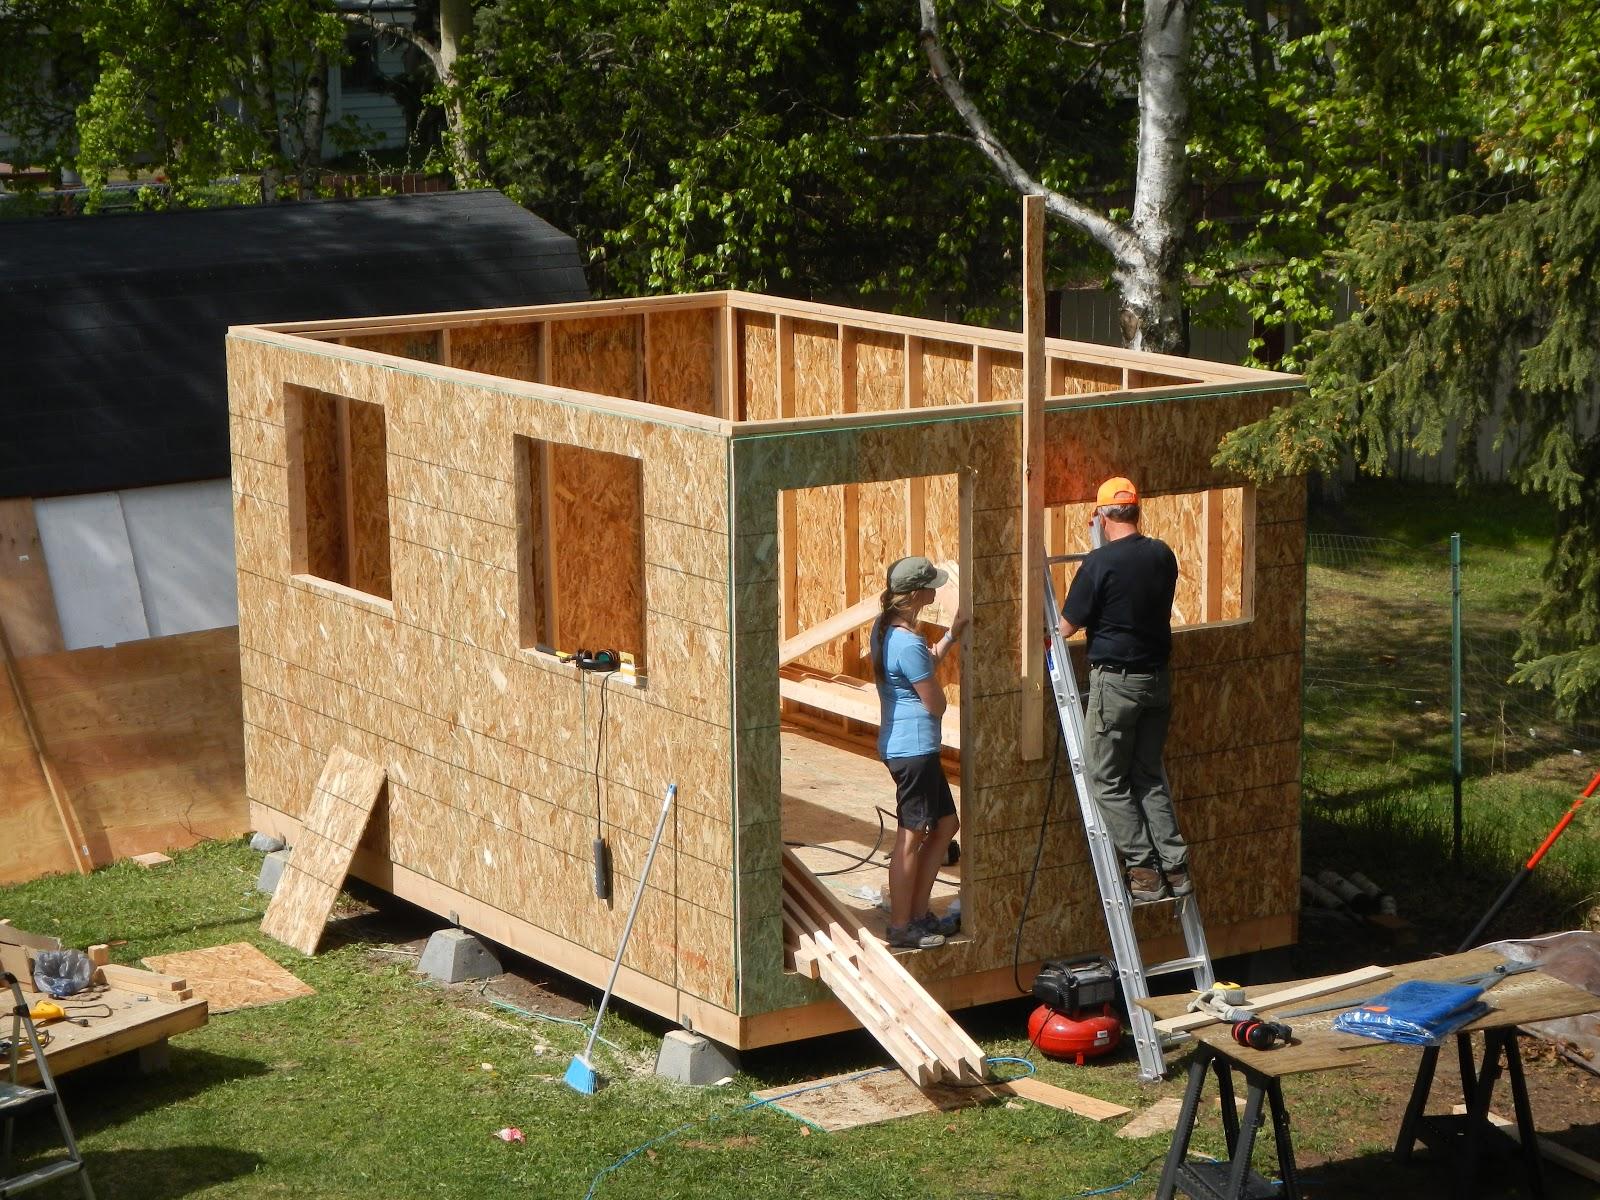 Building plans for 10x16 shed ~ Biek Plans shed